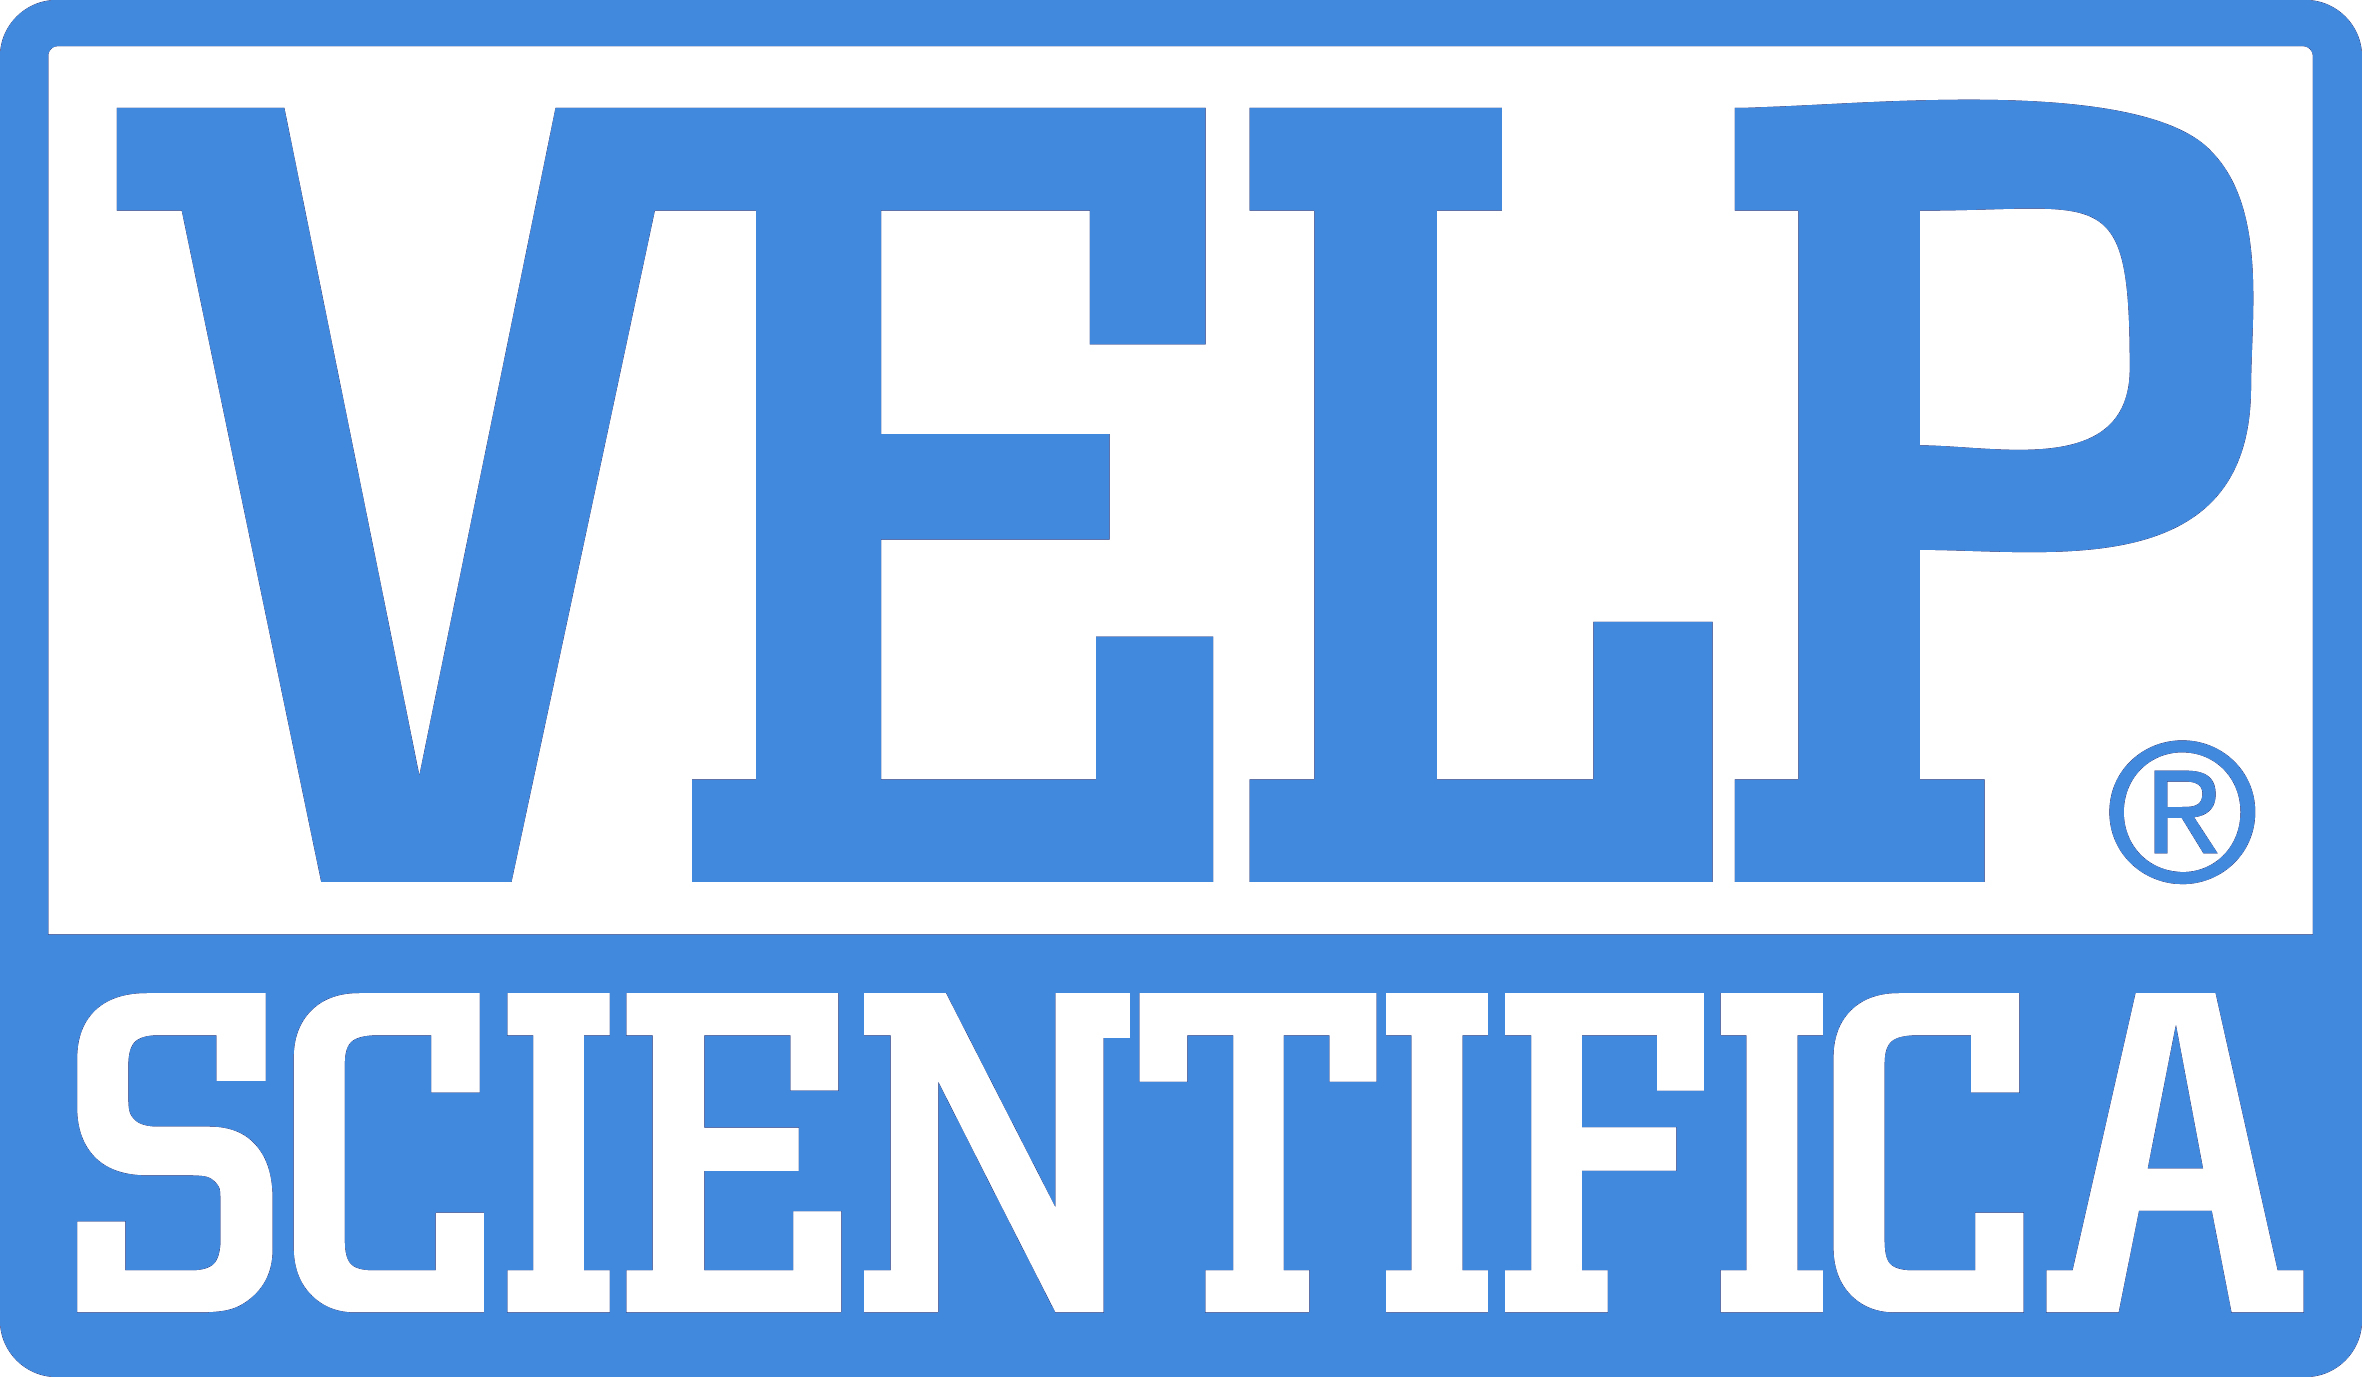 意大利VELP公司/VELP scientifica srl